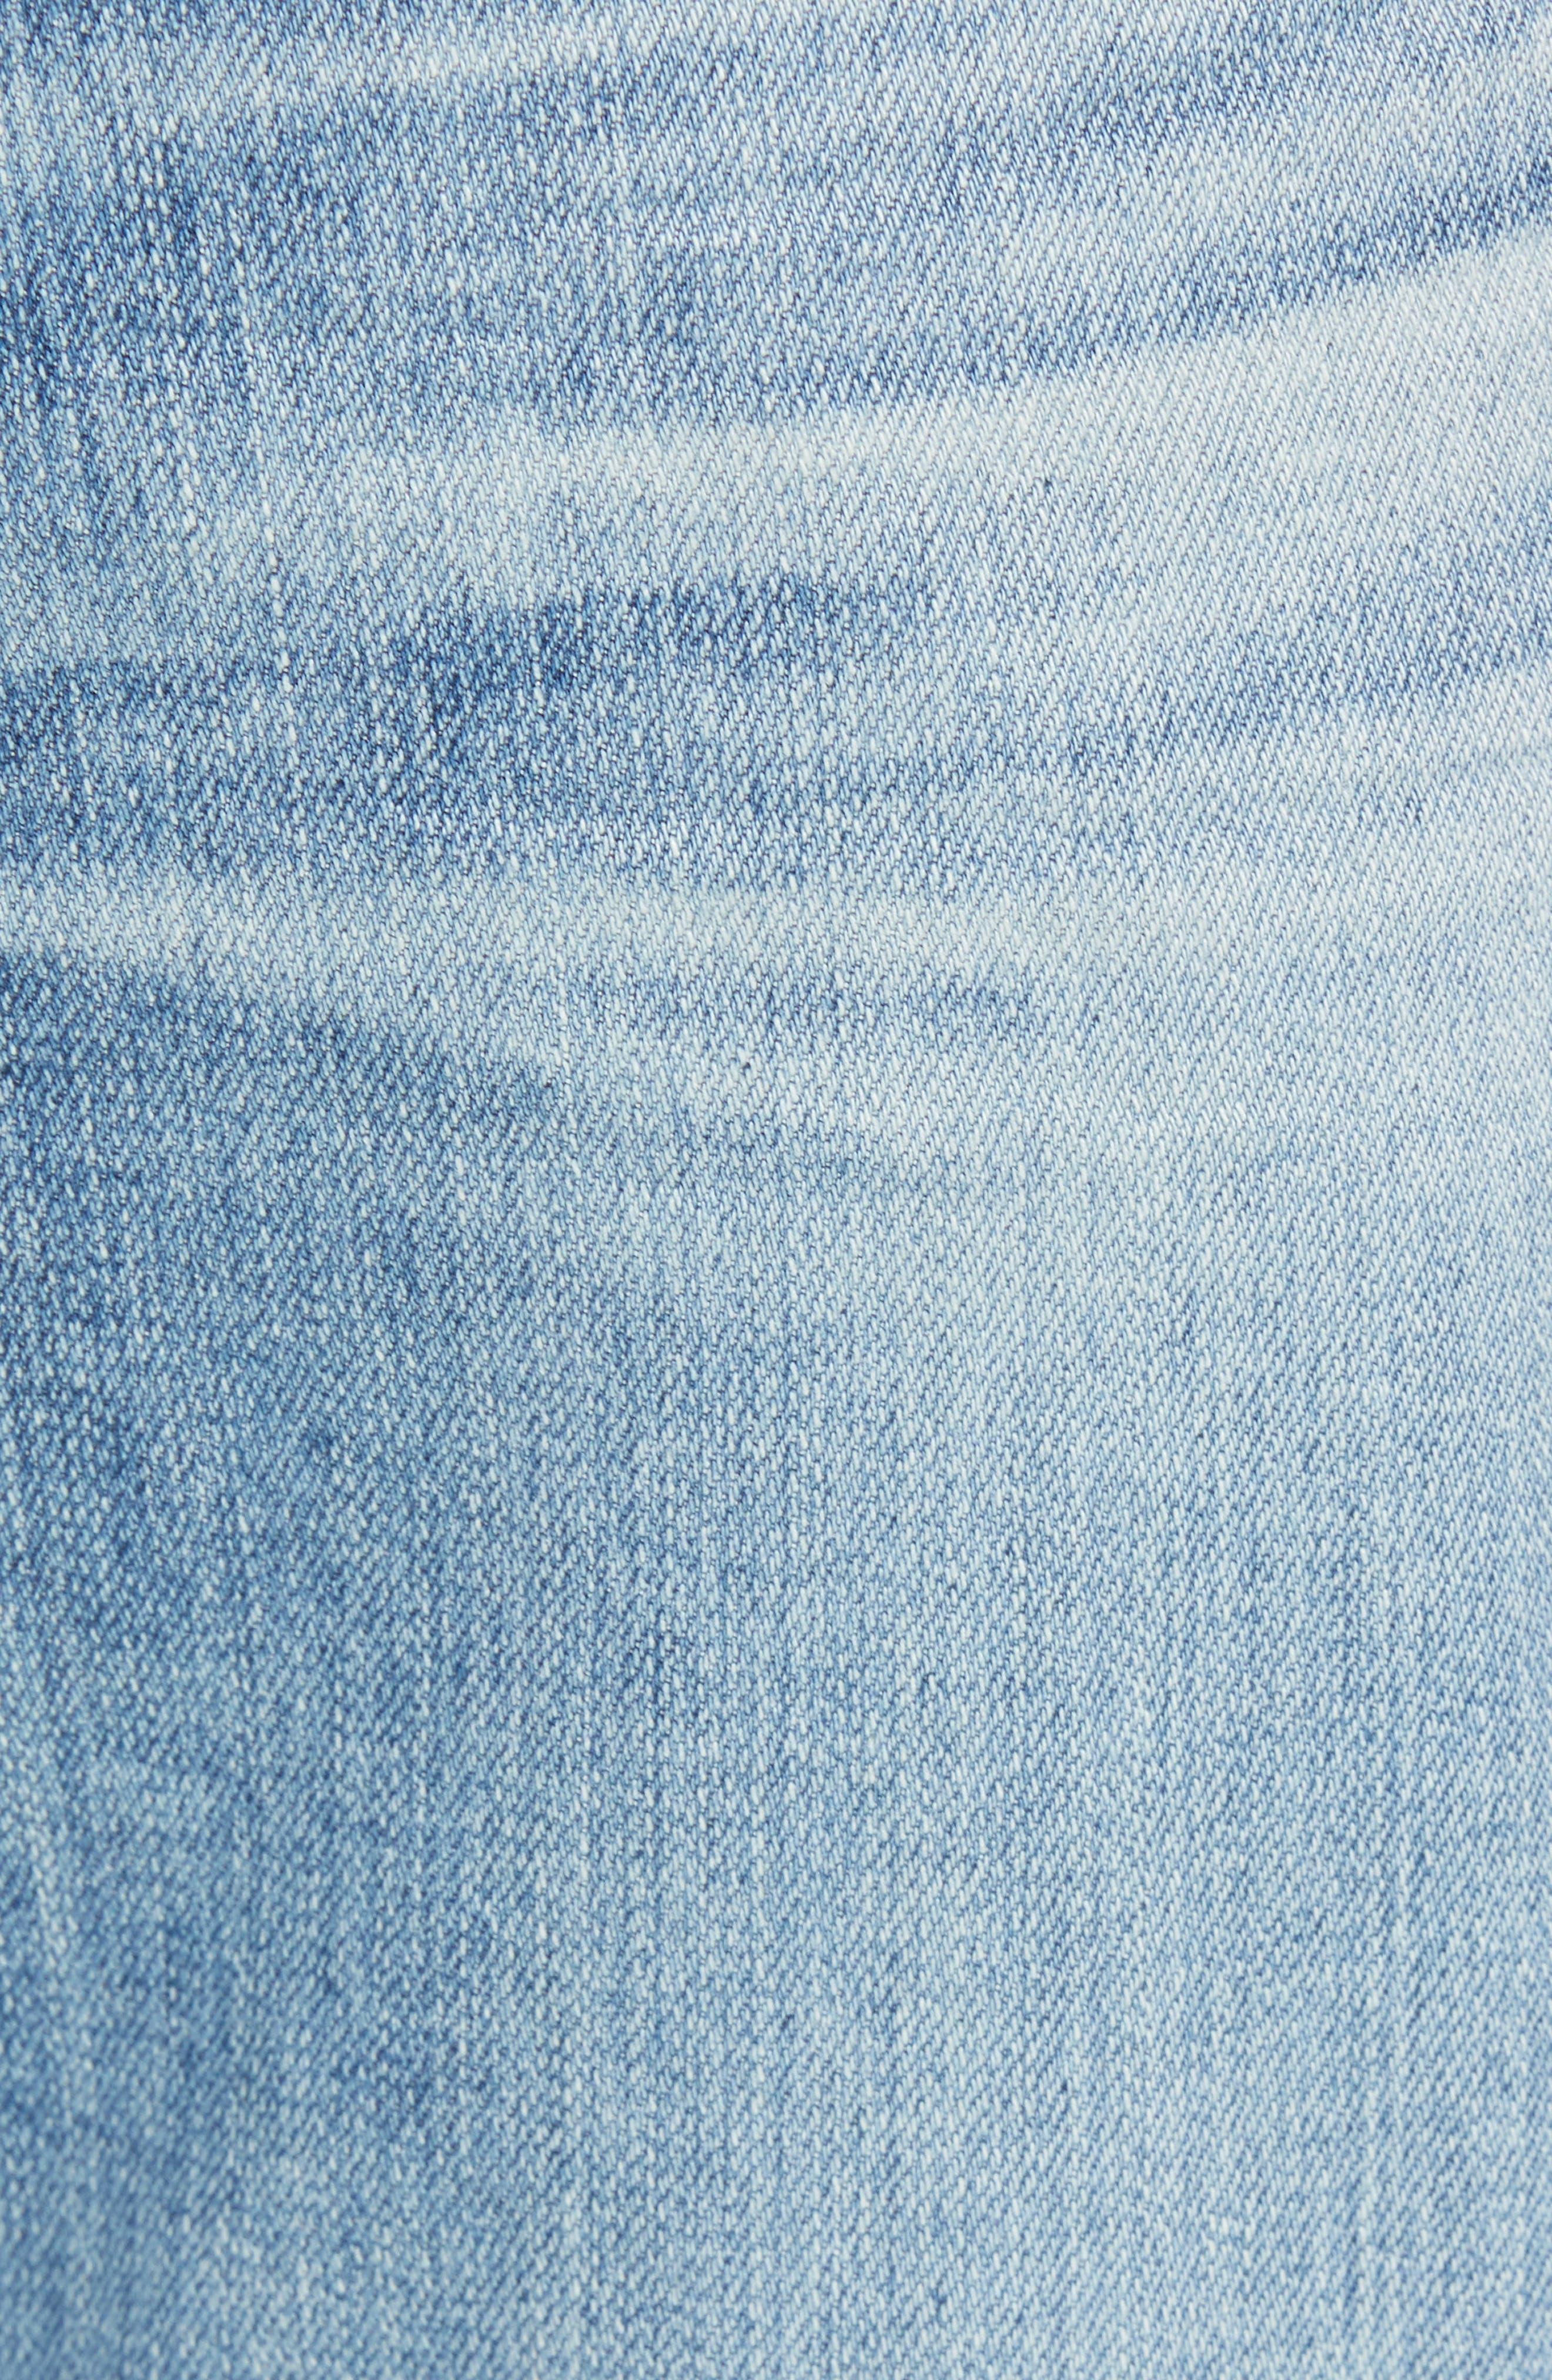 Everett Slim Straight Fit Jeans,                             Alternate thumbnail 5, color,                             18 Years Oceano